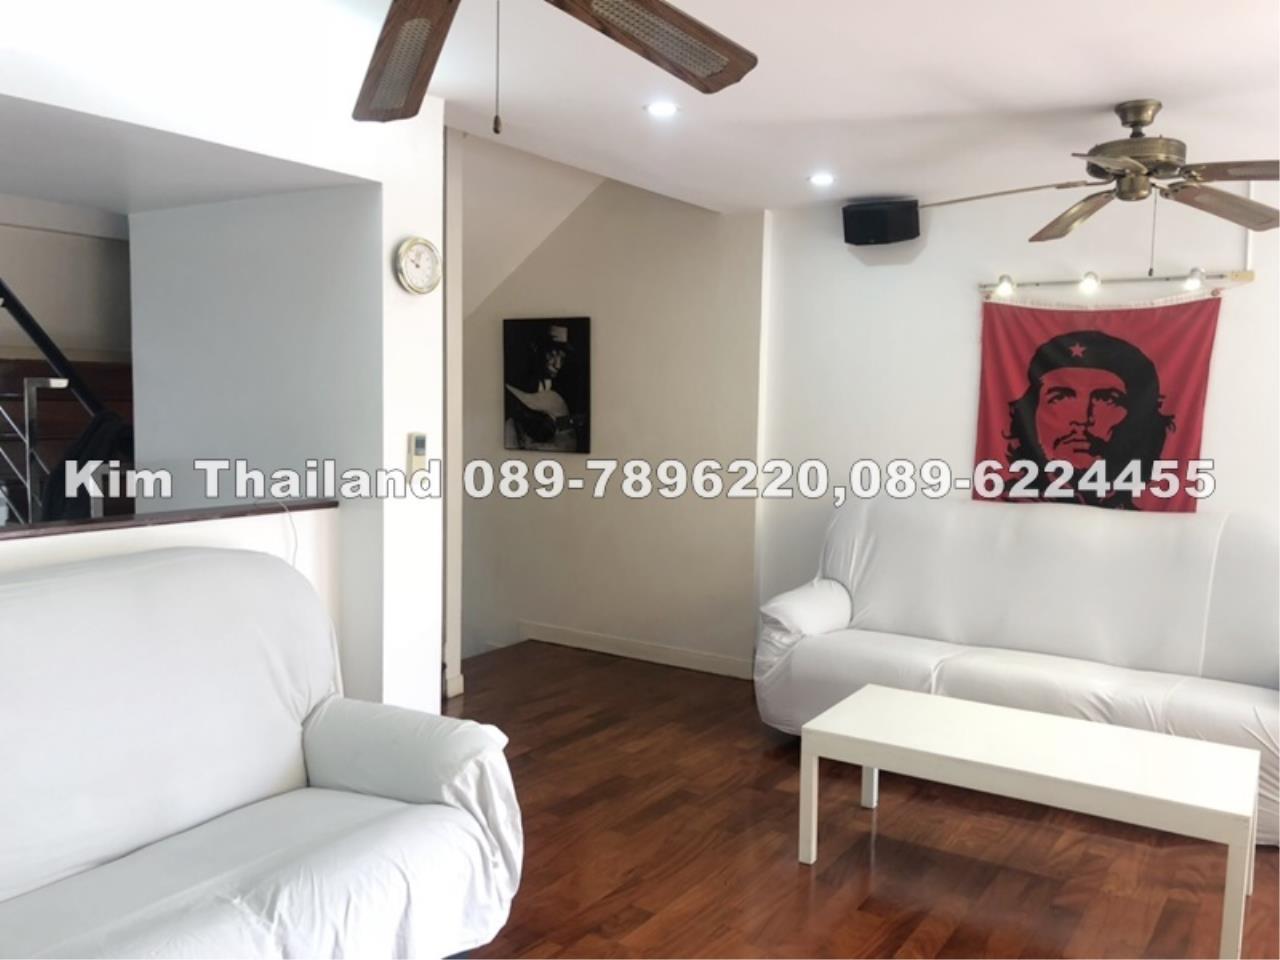 Kim Thailand Agency's ขายทาวน์เฮ้าส์ 4 ชั้น ย่านสุขุมวิท71 พื้นที่ 29.9 ตารางวา 4 ห้องนอน ขาย 15.7 ล้านบาท 2